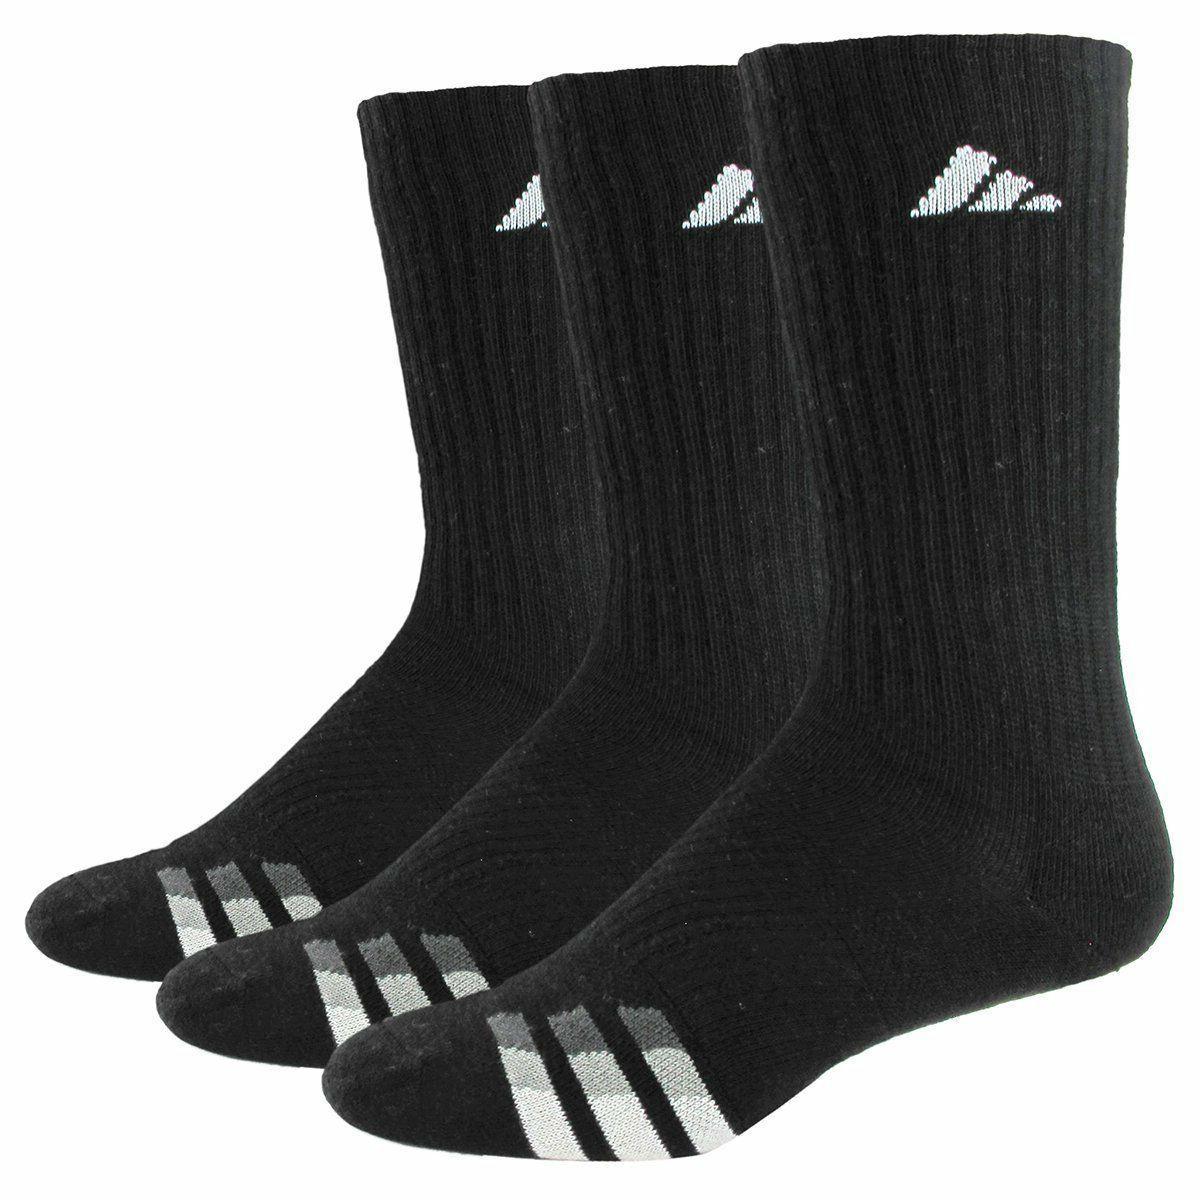 3 Pair Adidas Men's Cushioned Crew Socks Shoe Size 6-12 Vari